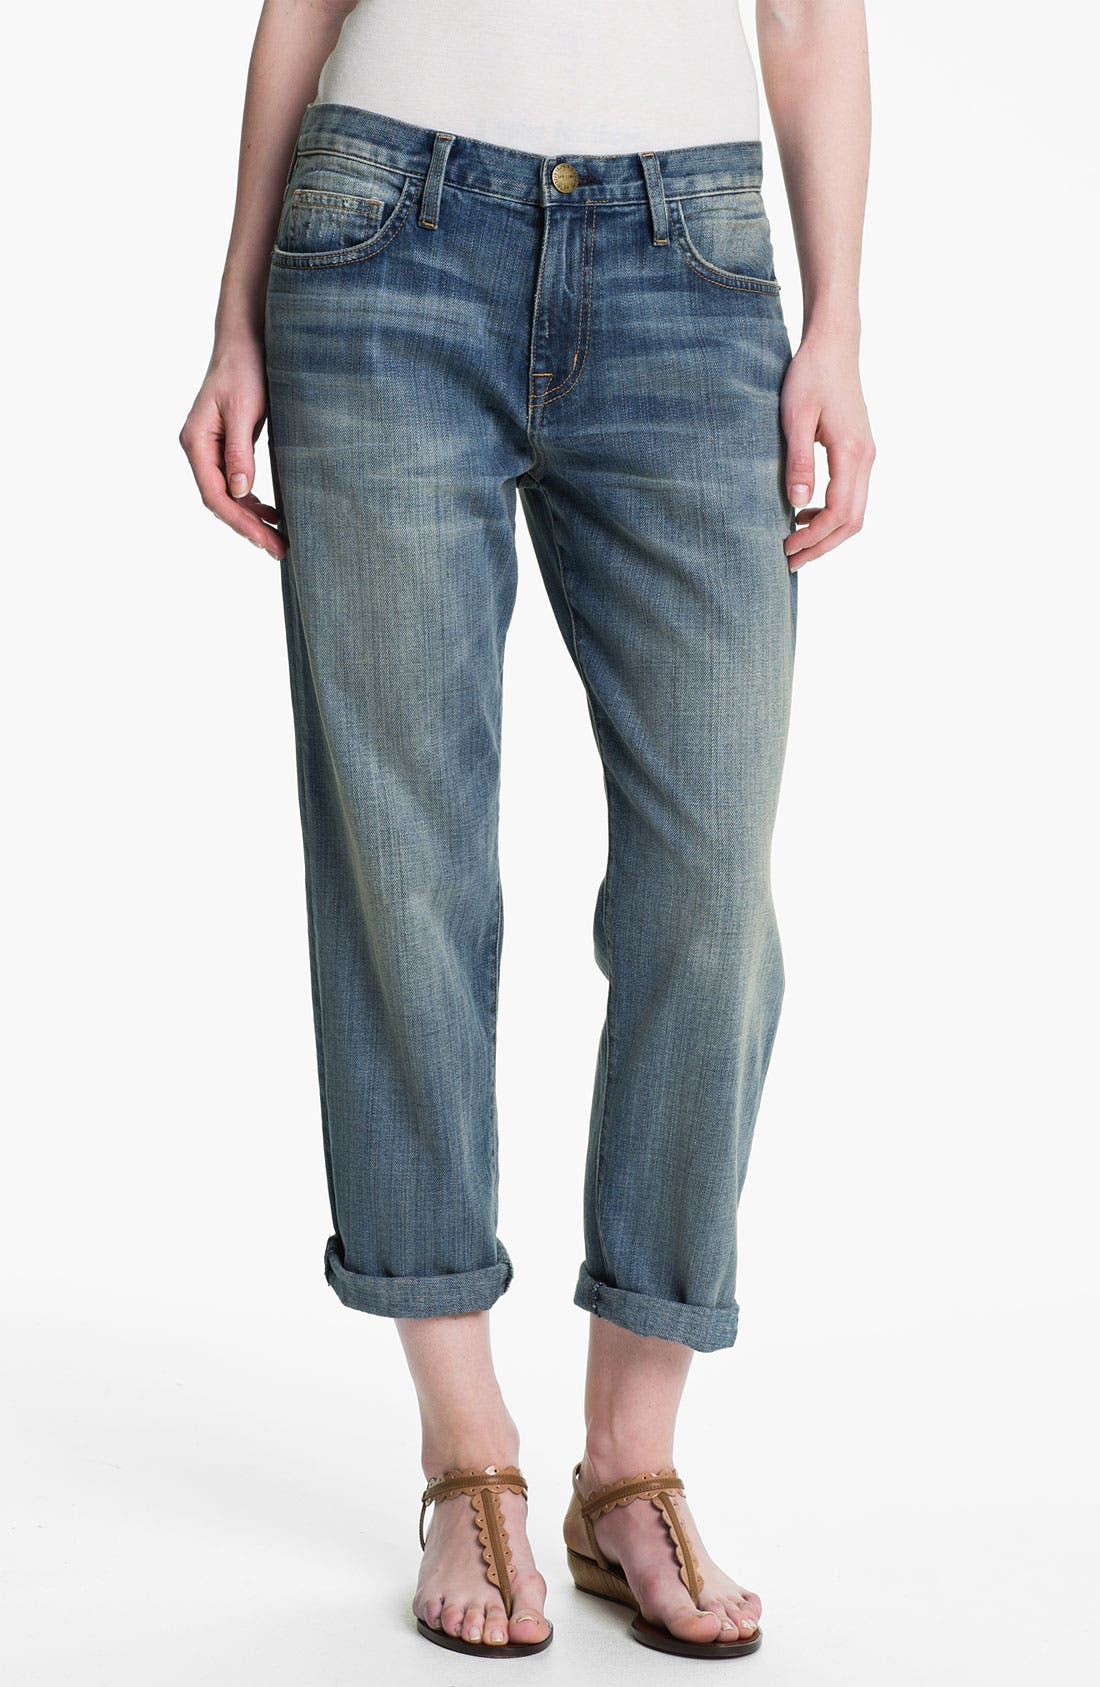 Main Image - Current/Elliott 'The Boyfriend Jean' Stretch Jeans (Super Loved)